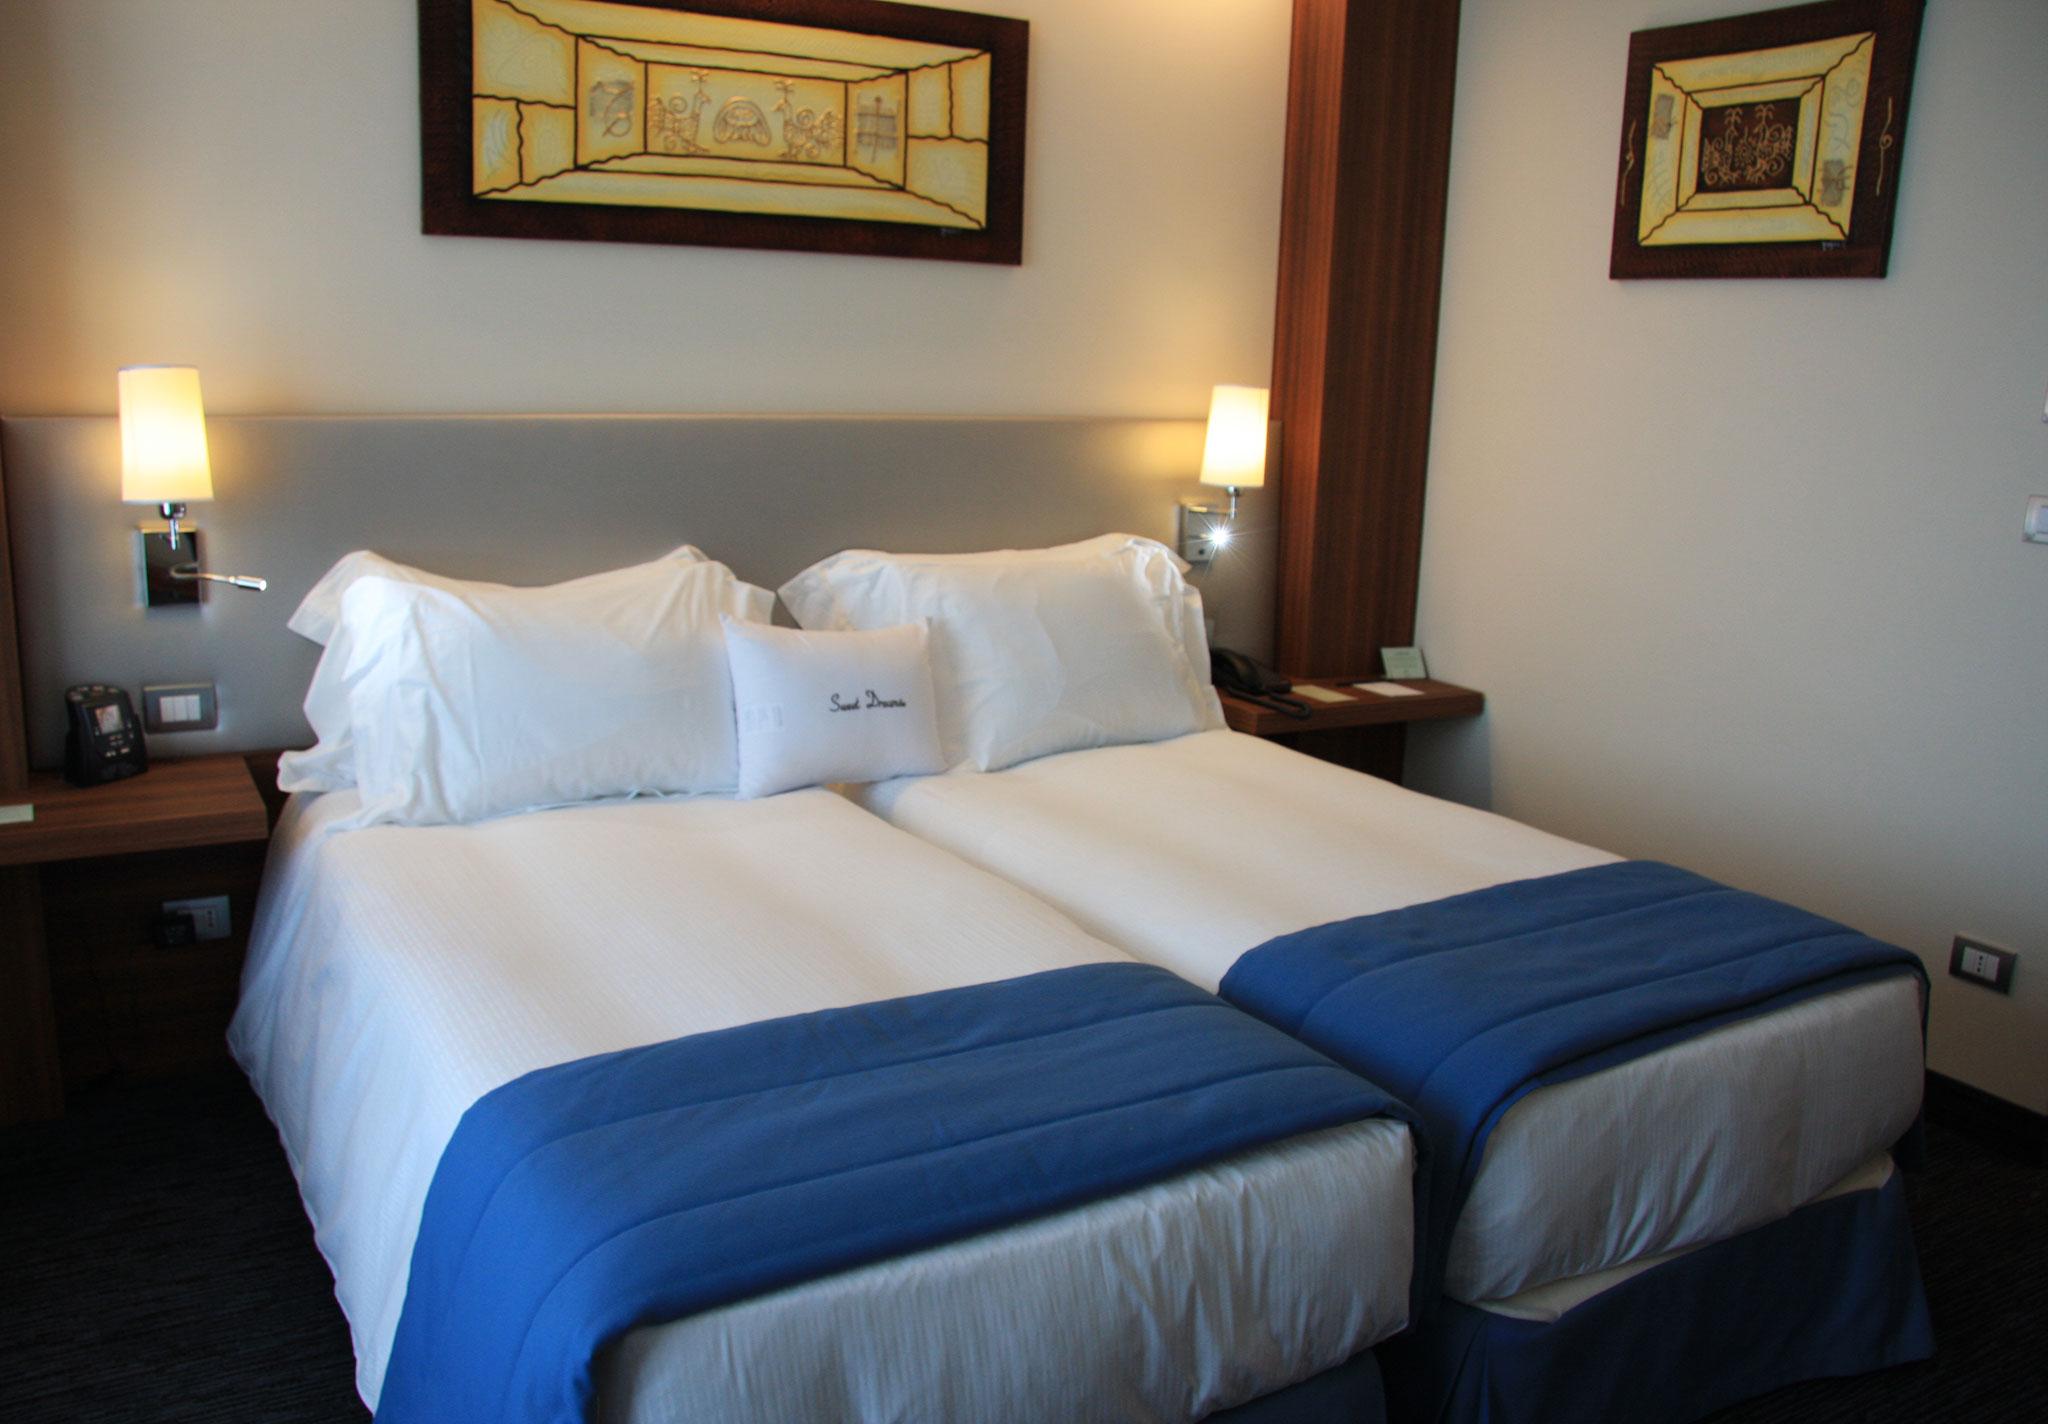 Olbia hotel in sardegna doubletree by hilton hotel for Hilton hotel italia